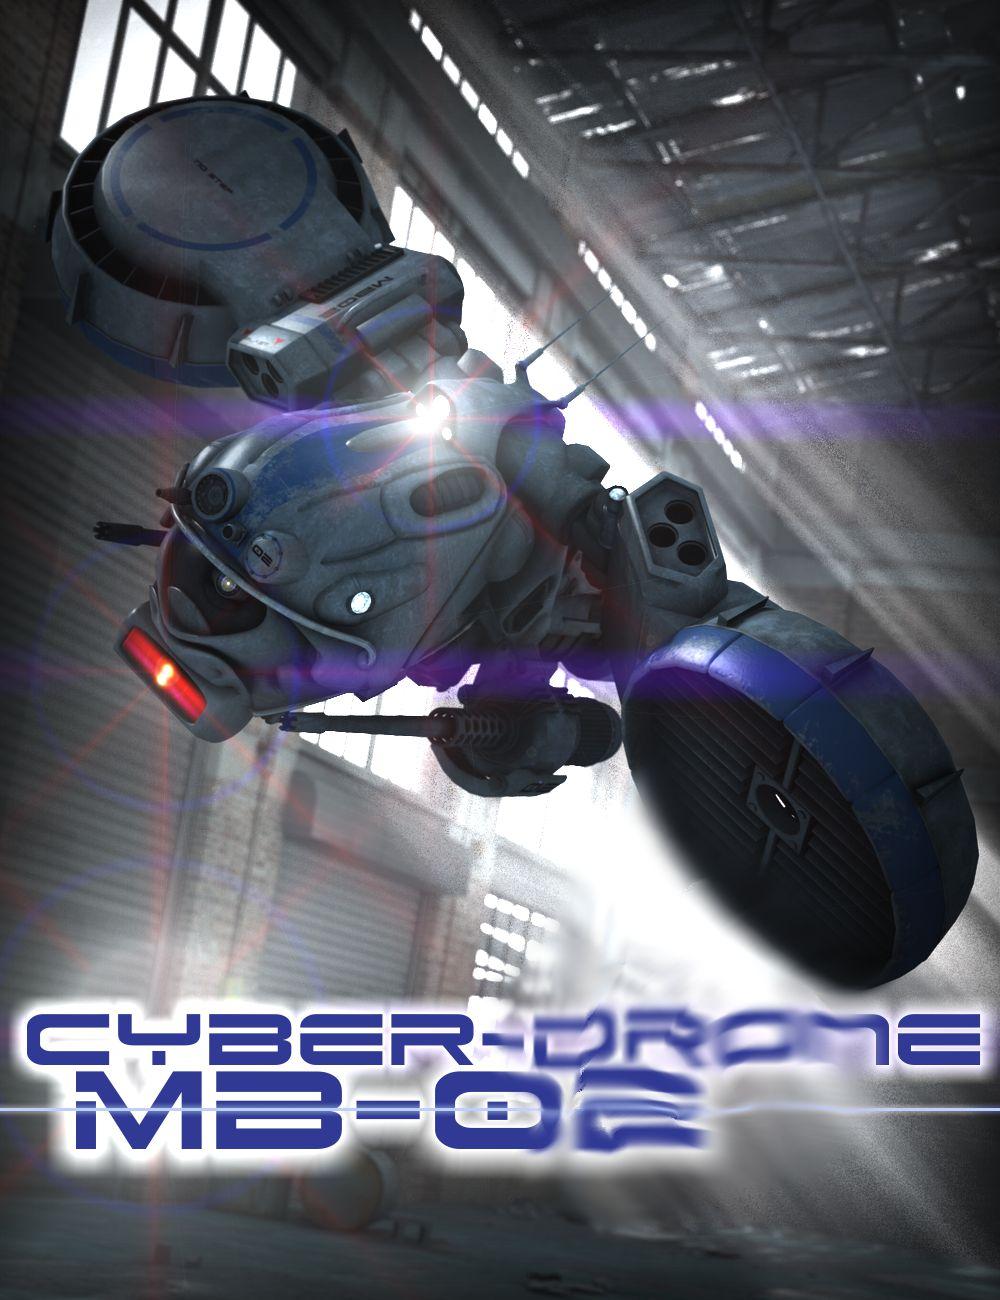 Cyber Drone by: DzFire, 3D Models by Daz 3D